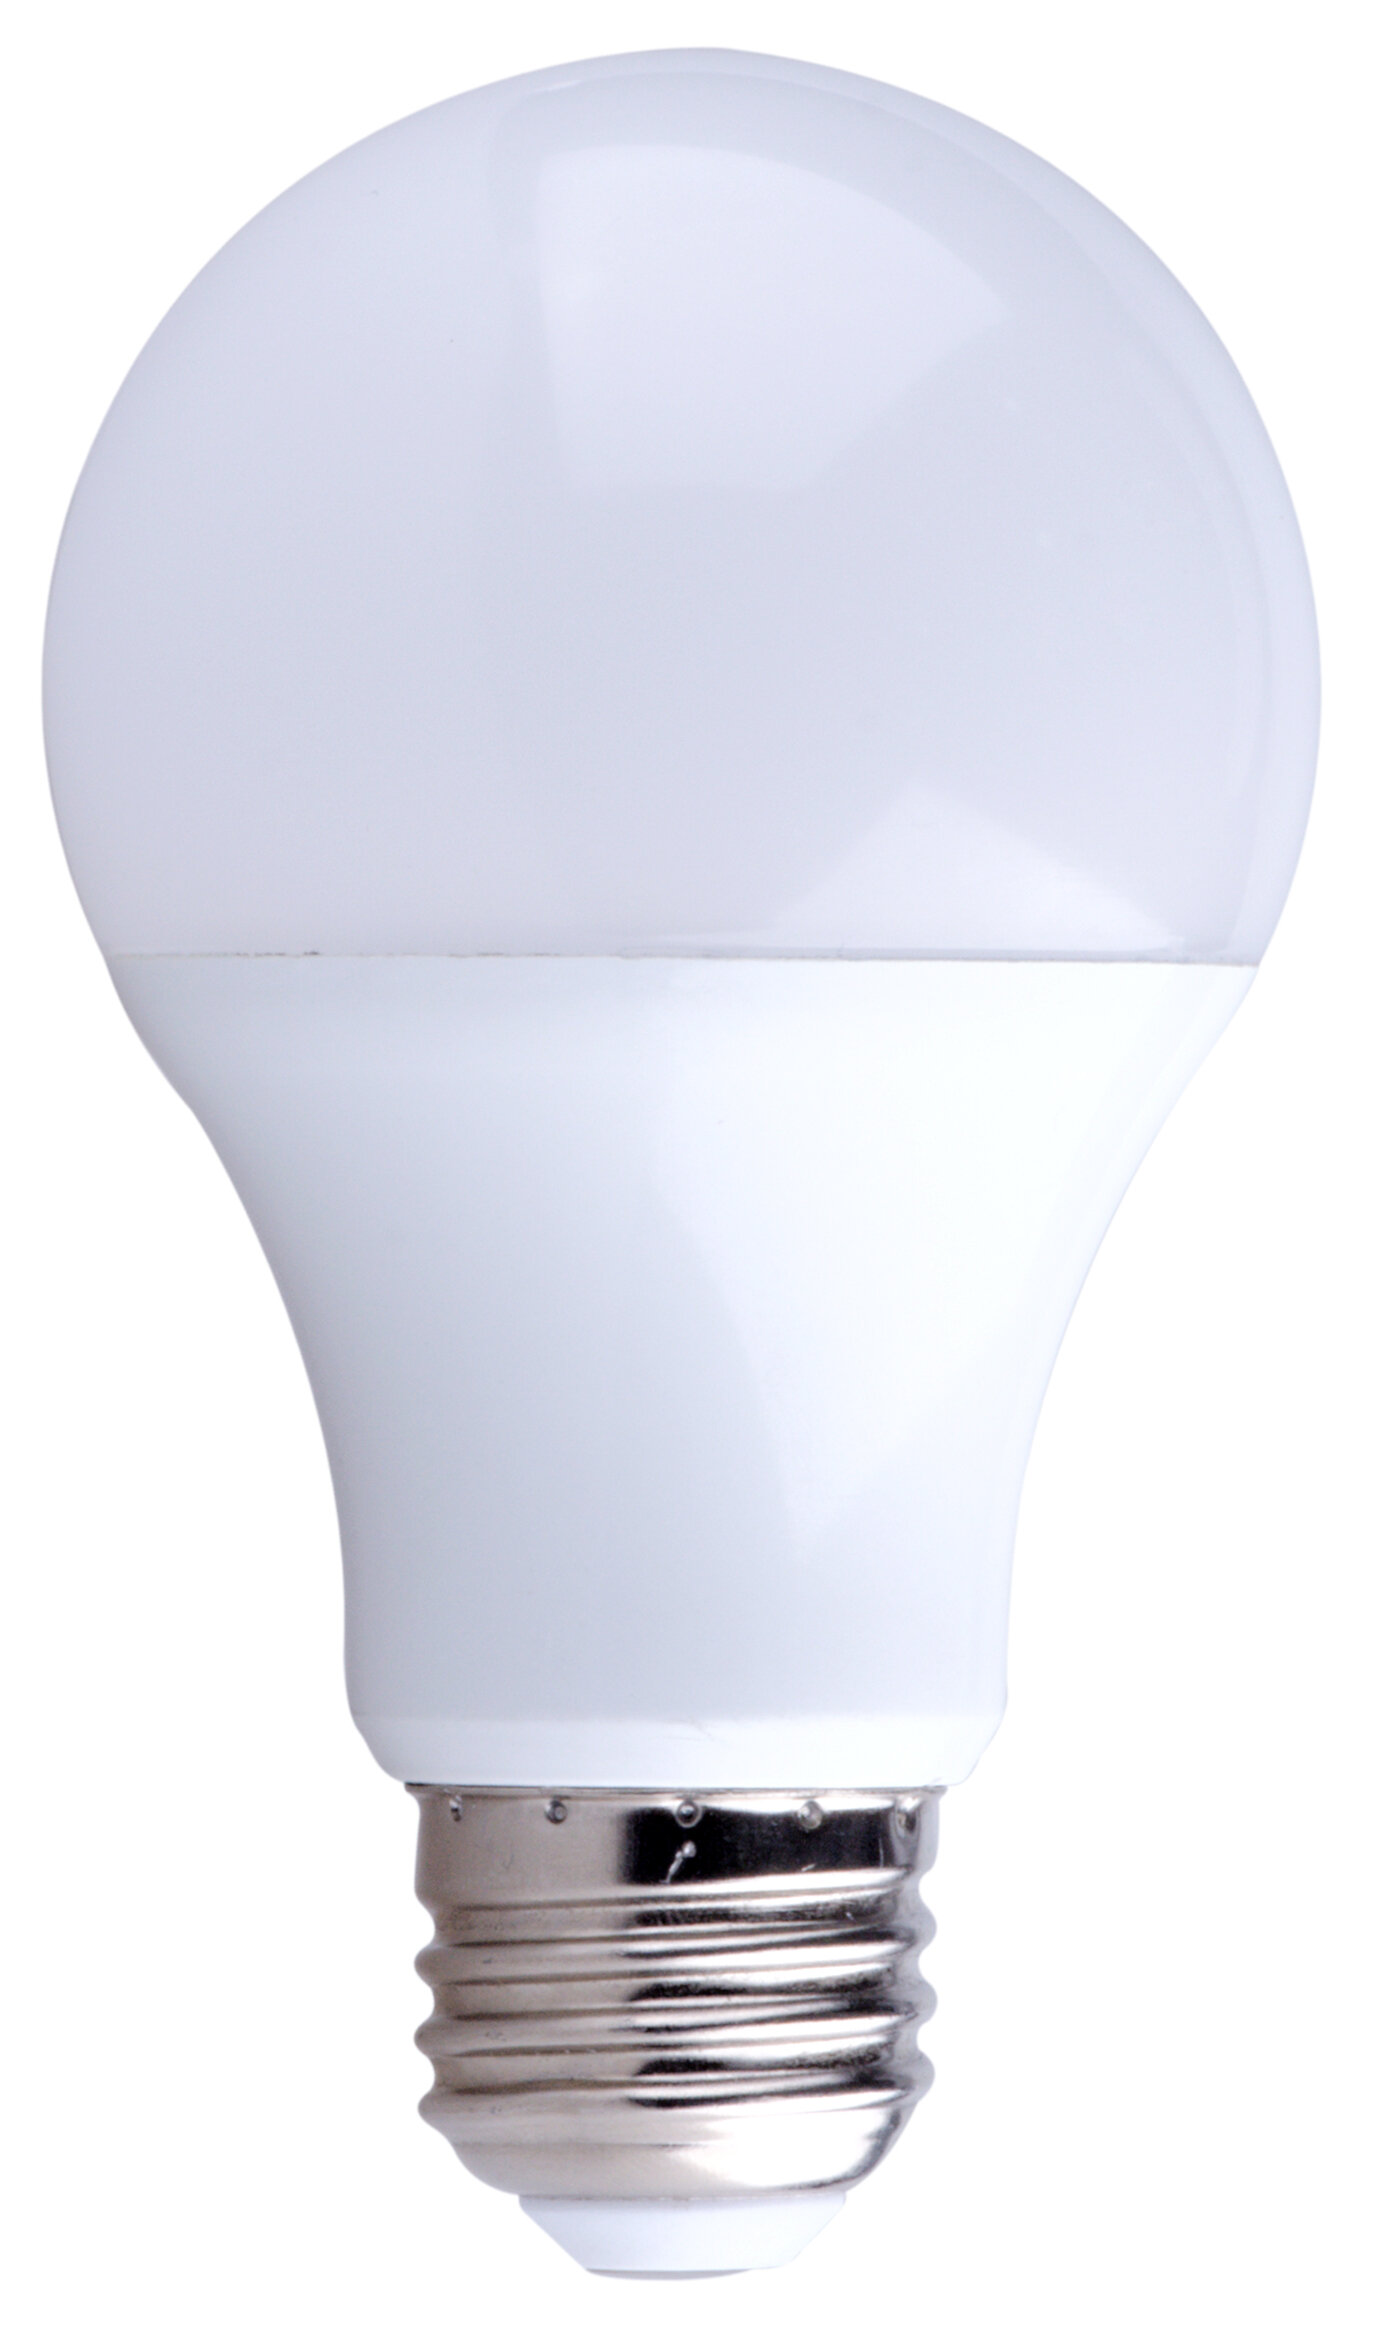 Merveilleux E26/Medium (Standard) LED Light Bulb